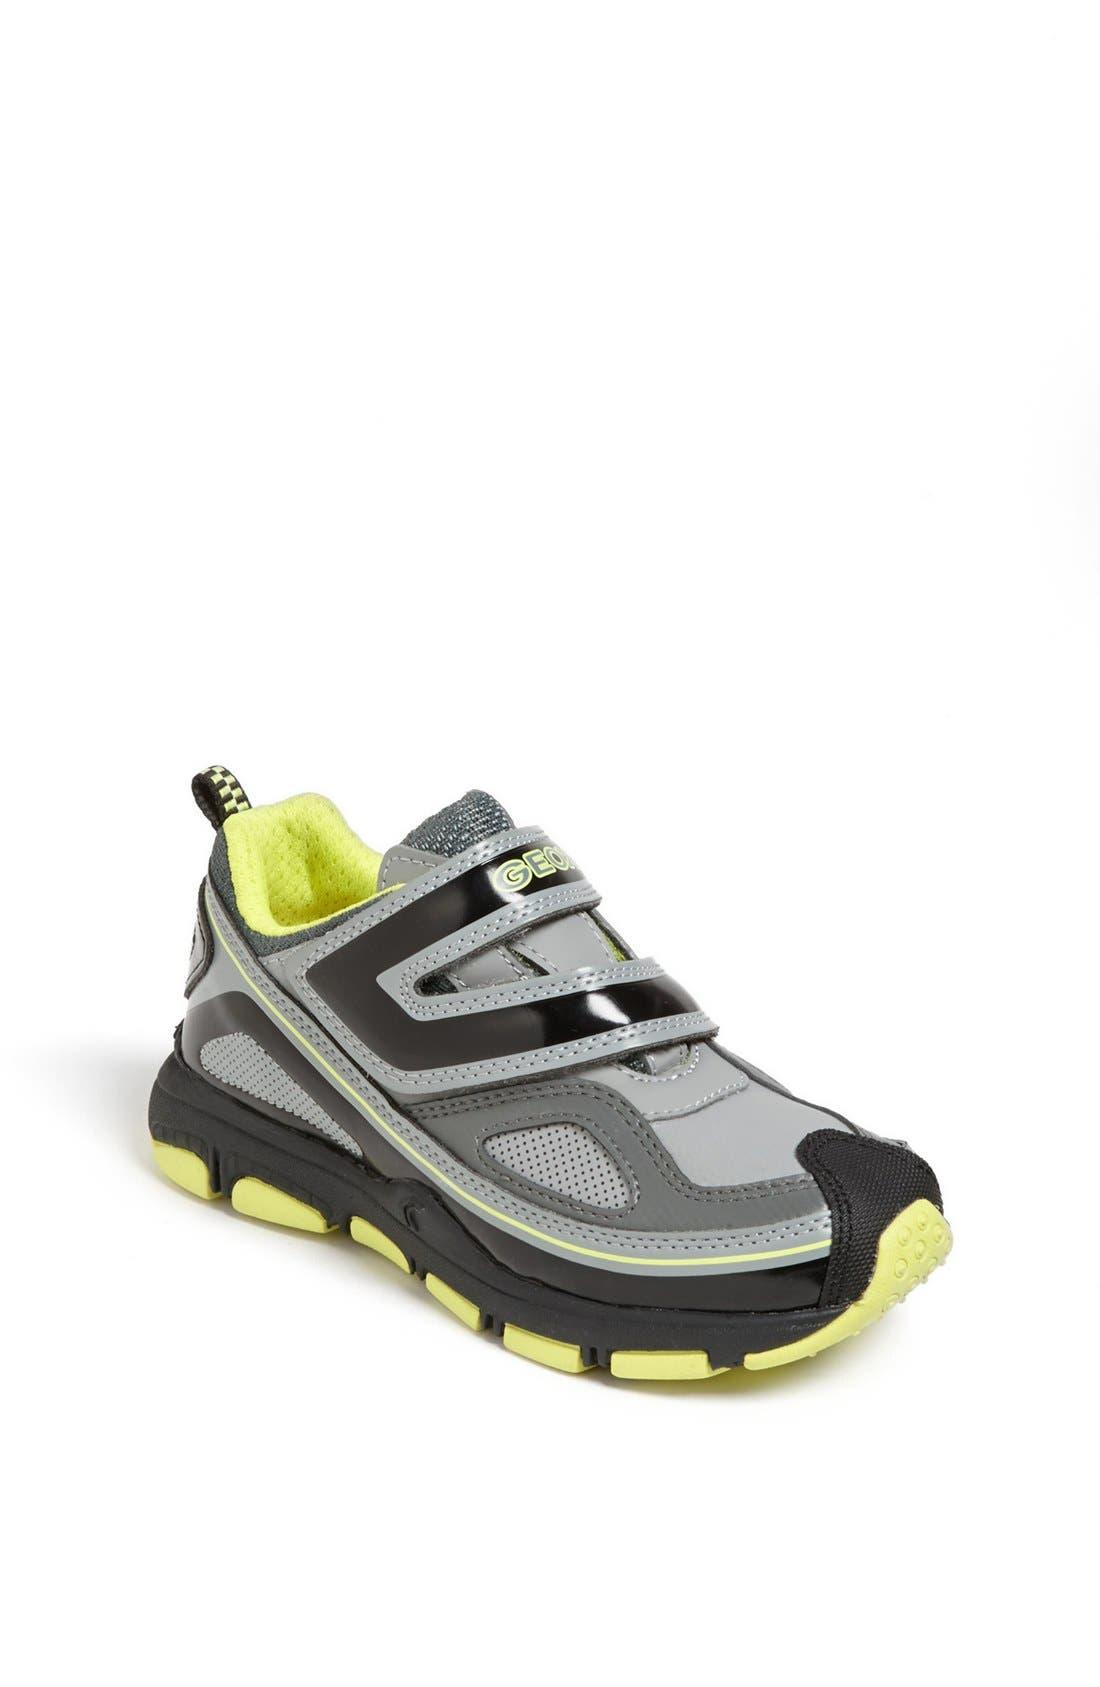 Main Image - Geox 'Torque 4' Sneaker (Toddler, Little Kid & Big Kid)